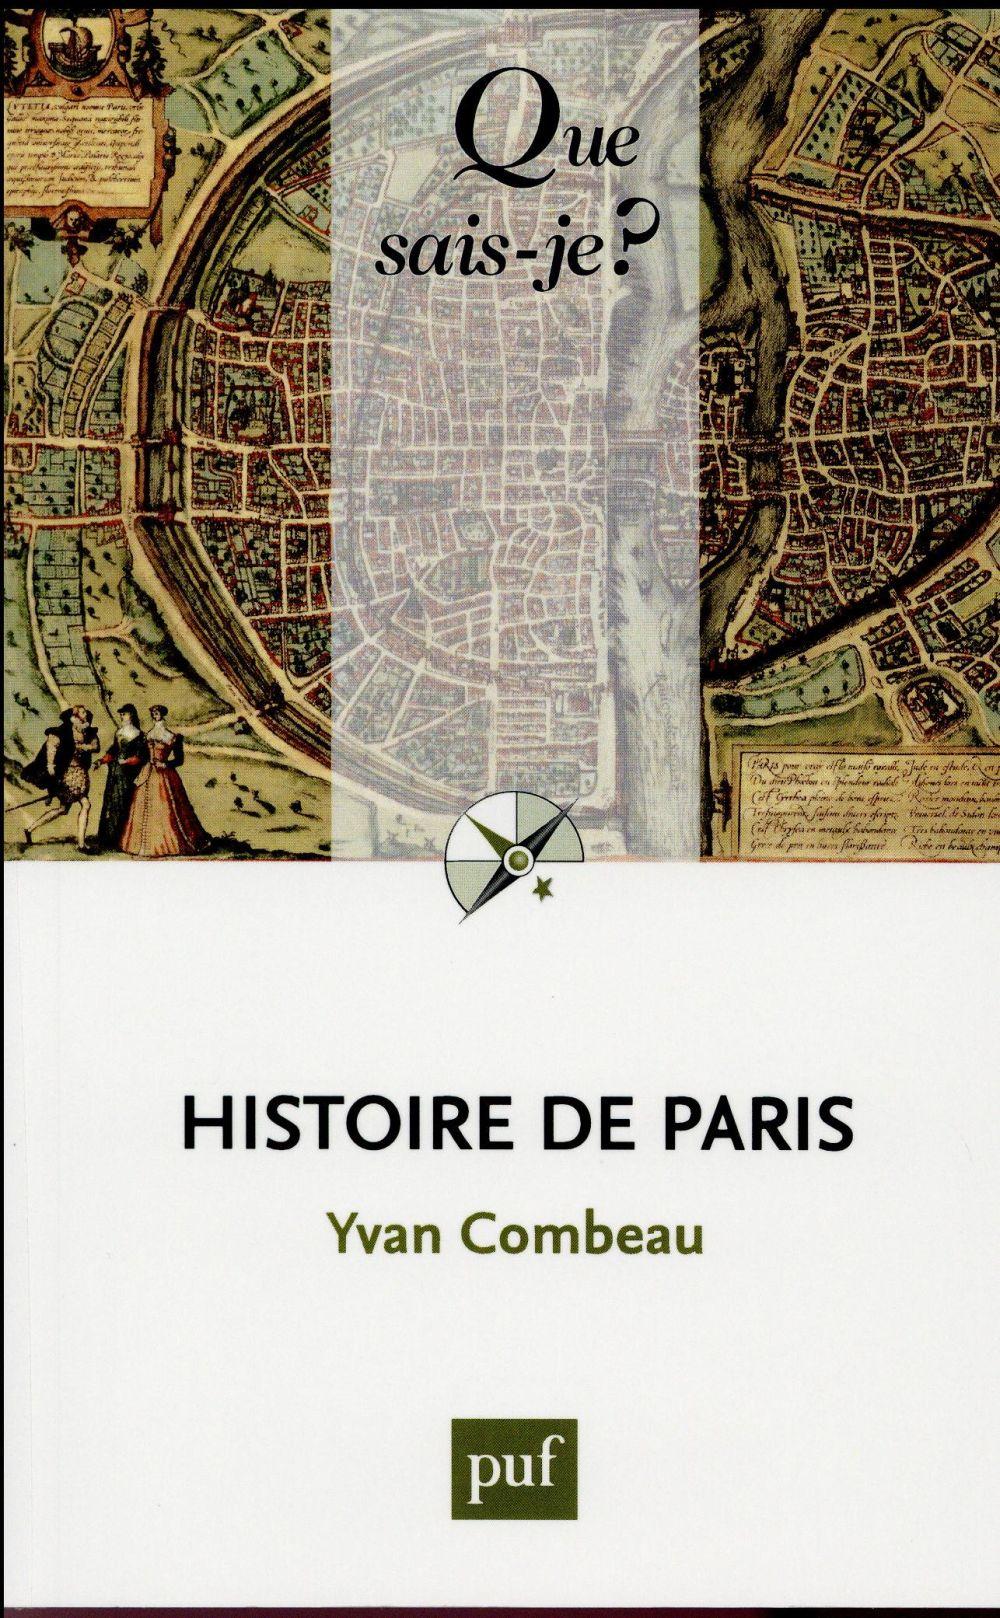 HISTOIRE DE PARIS COMBEAU YVAN PUF